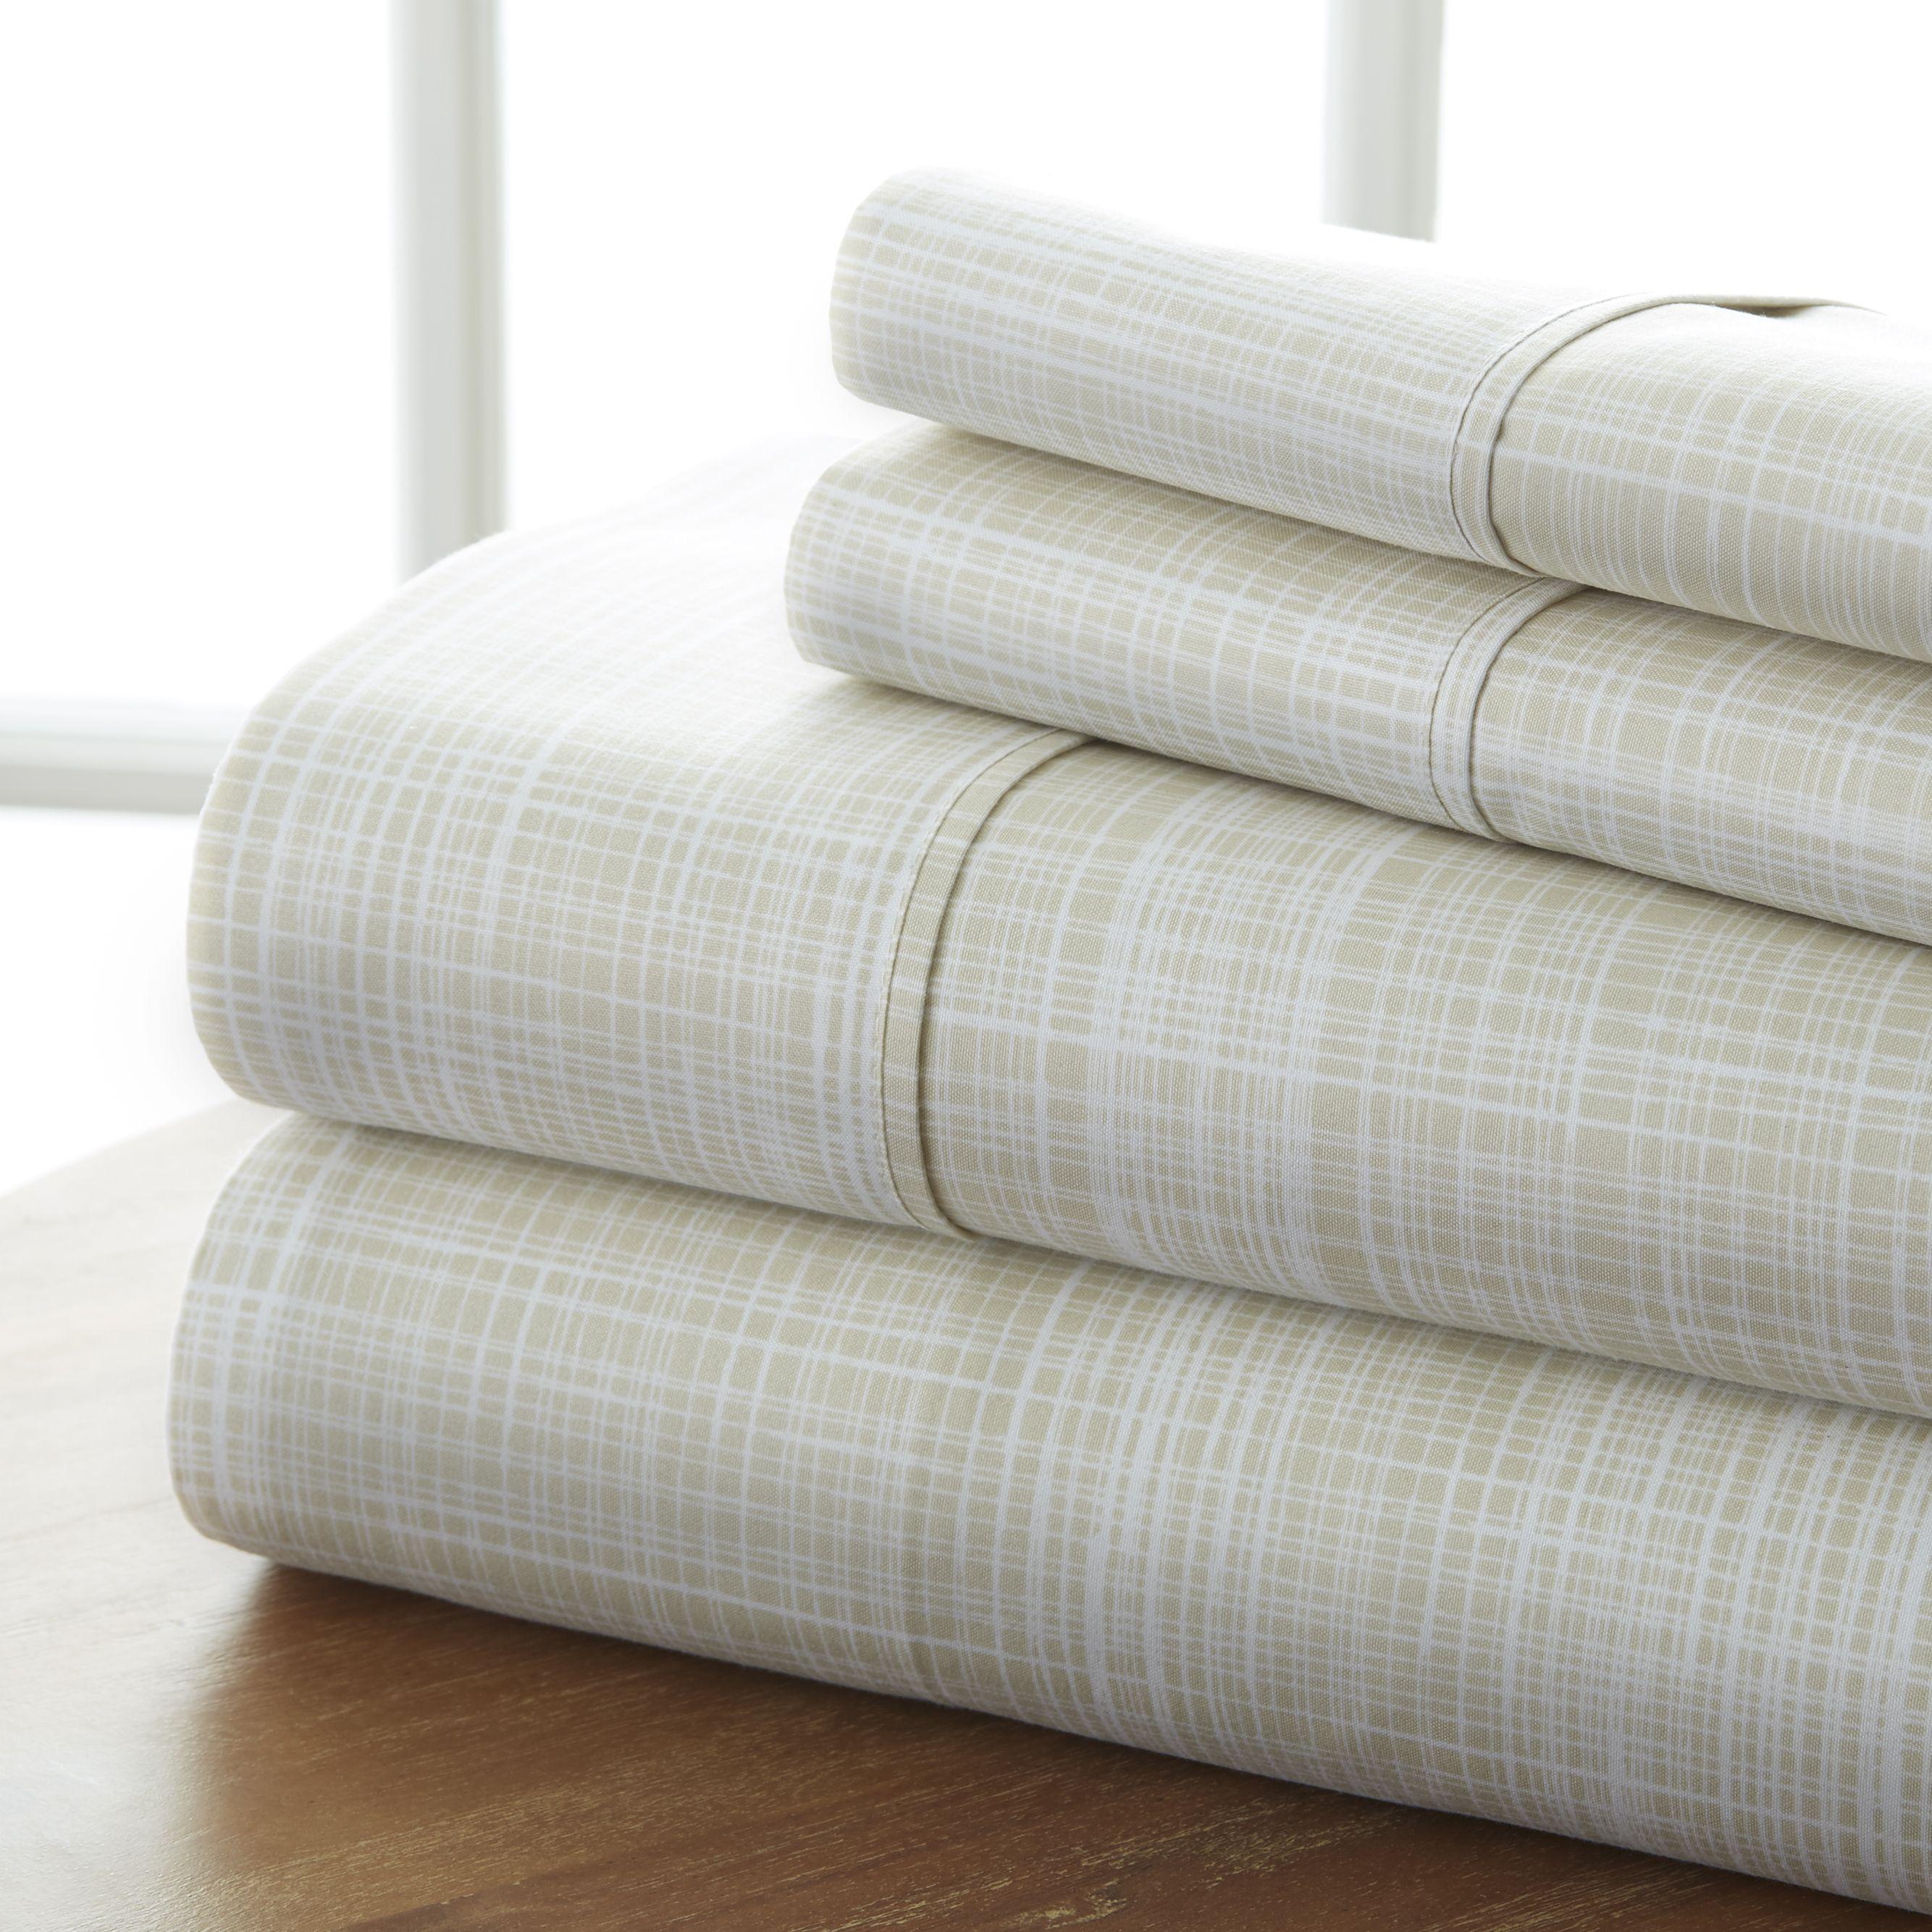 4 Piece Polka Dot Printed Sheet Set Ultra Soft Premium Hotel Collection